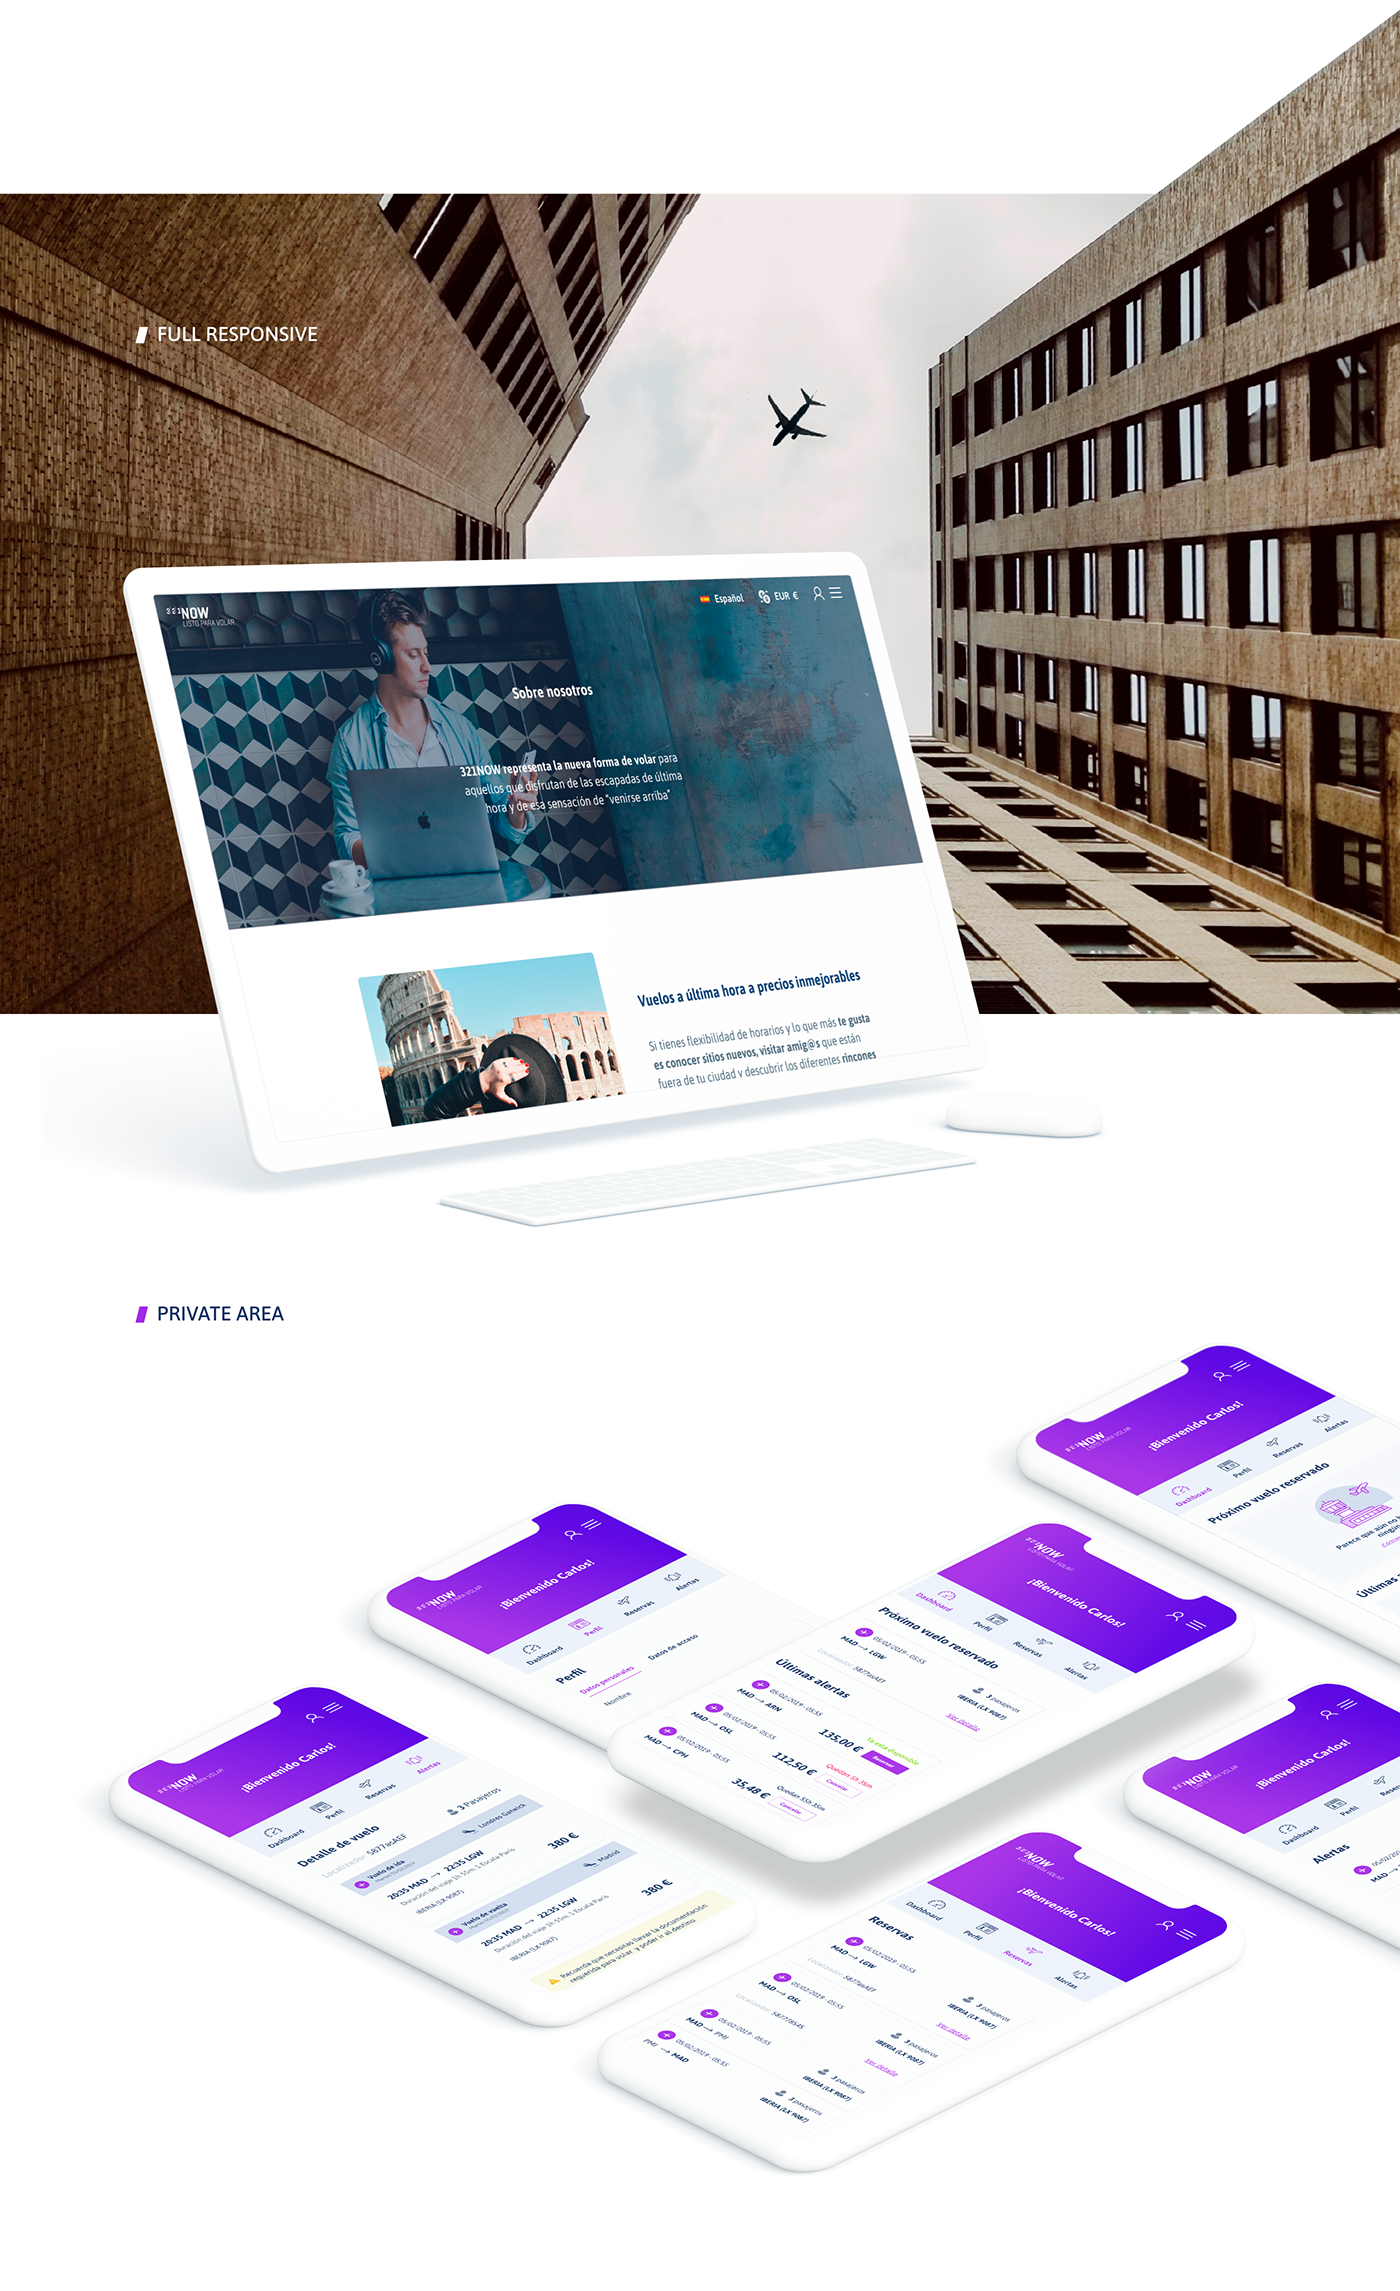 flight,Fly,Travel,Travell app,web app,clean,presentation,purple